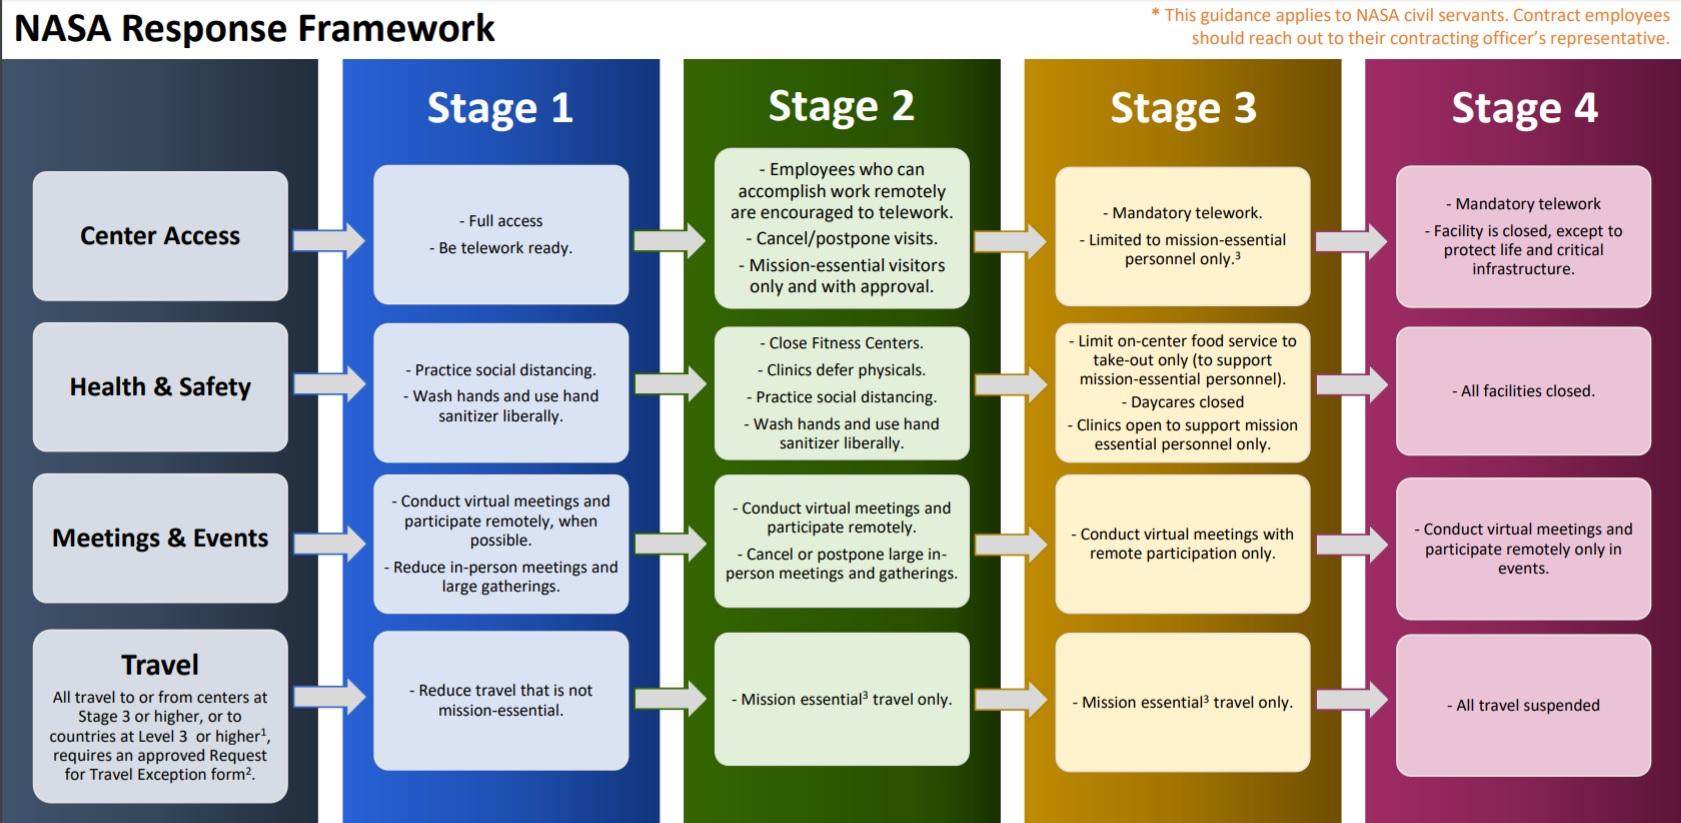 NASA response framework levels